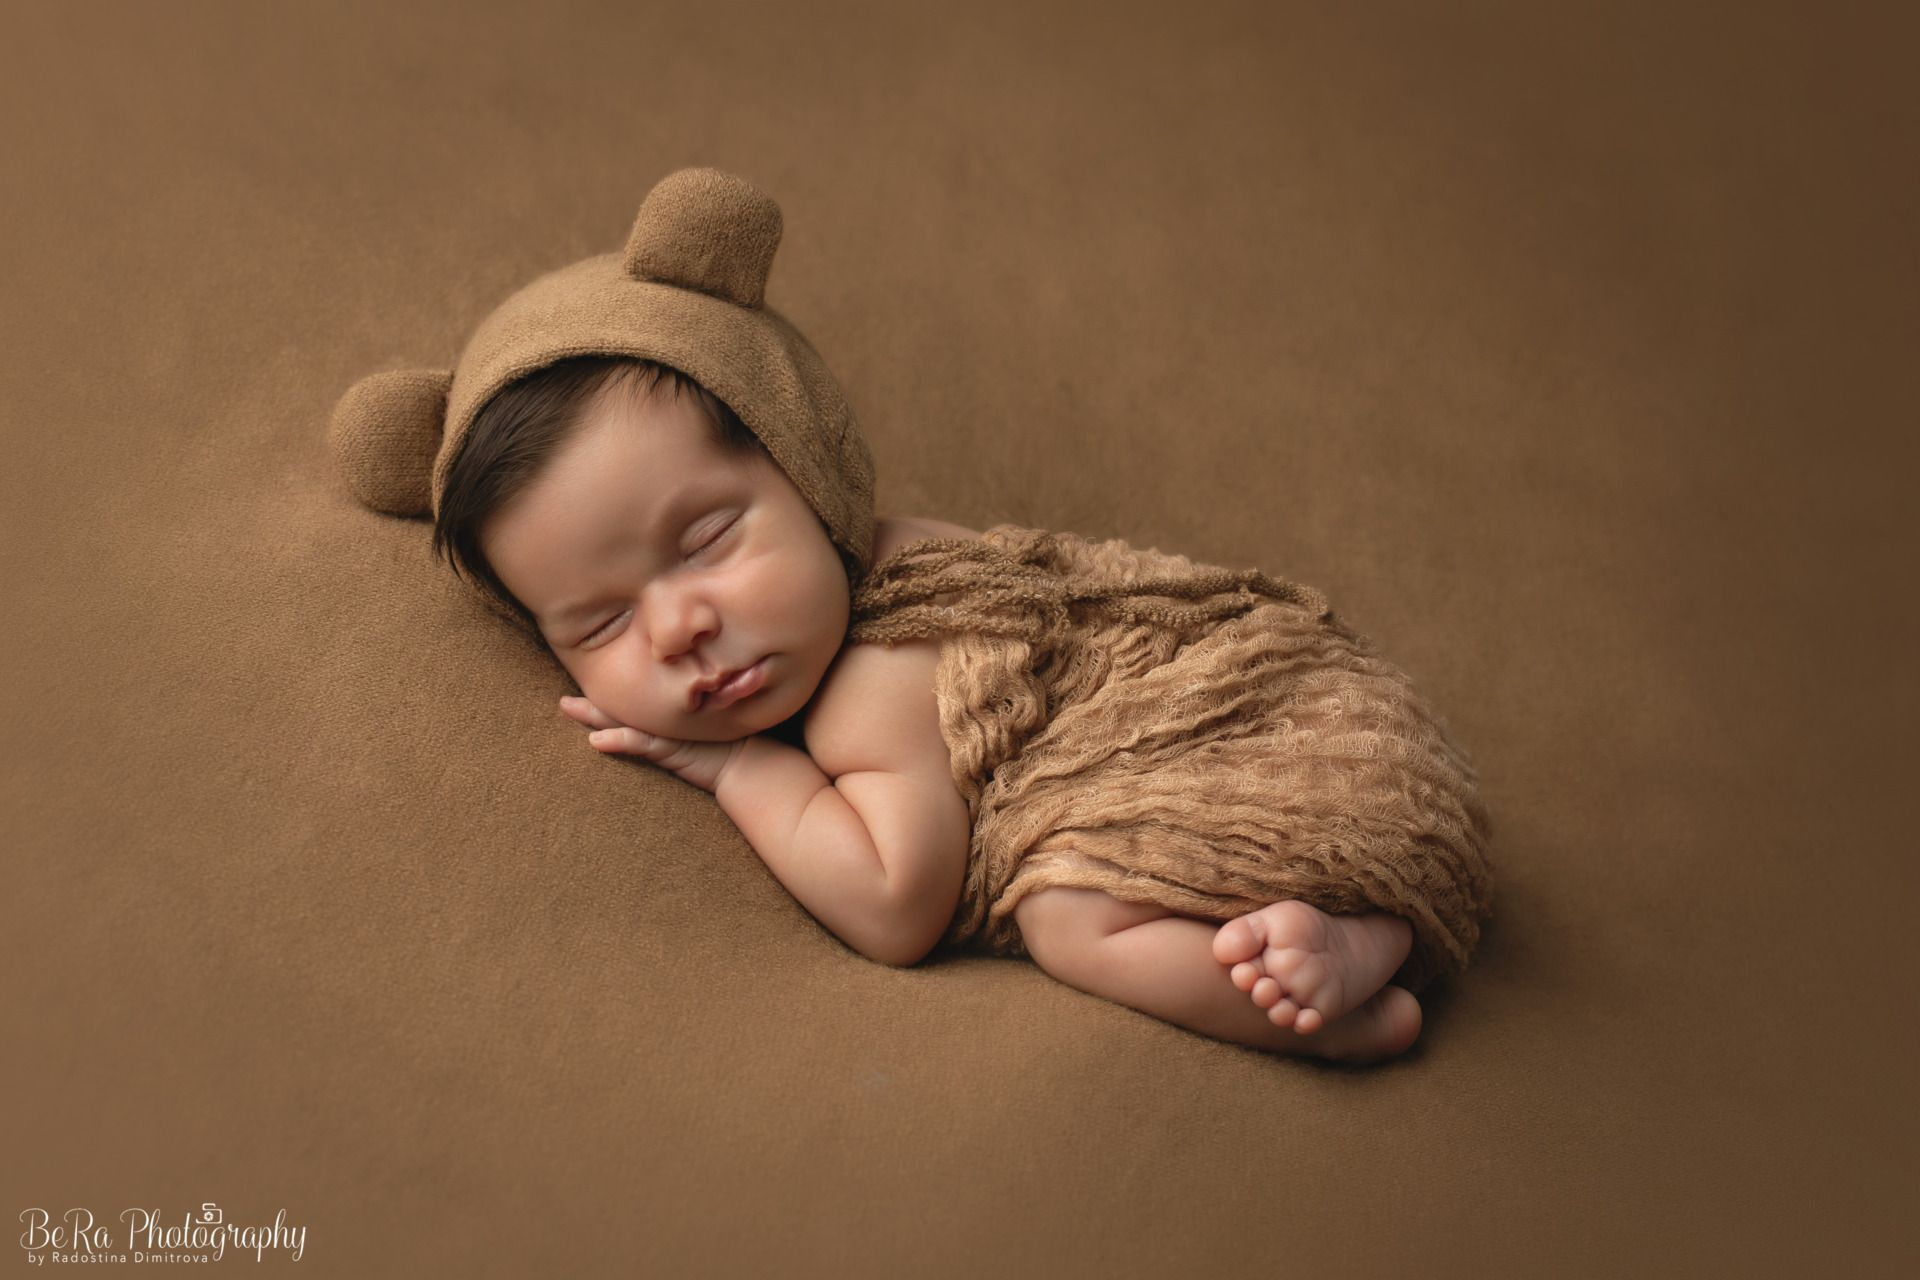 SESIONES DE RECIÉN NACIDO FUERTEVENTURA Bera Photography FOTÓGRAFO INFANTIL